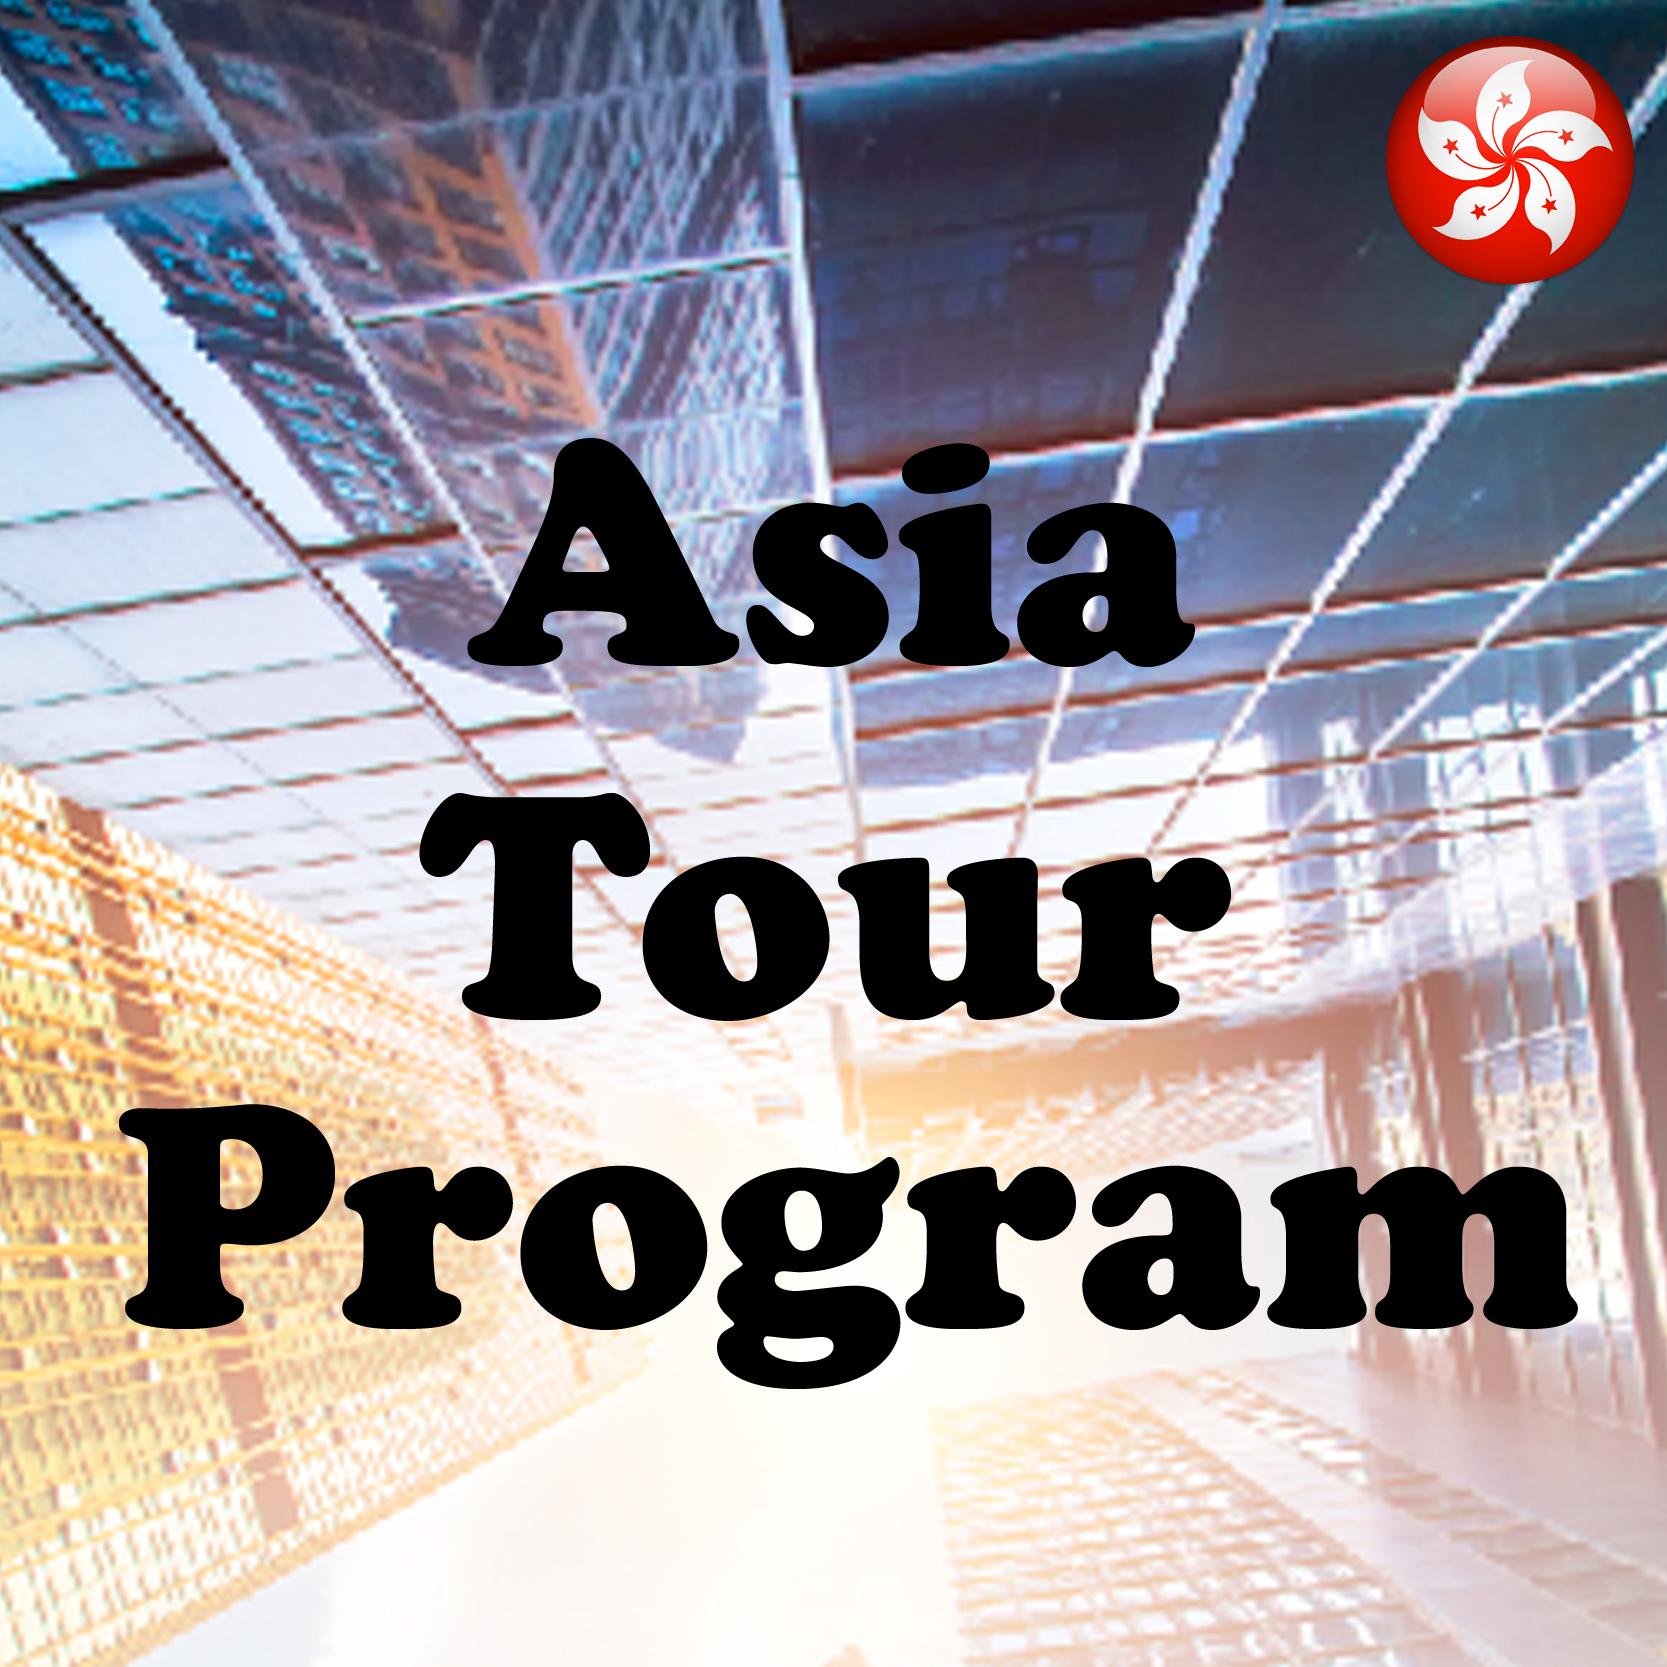 July 12-13 - 2 Days 1 Night Asia Tour Program 2018 , Hong Kong